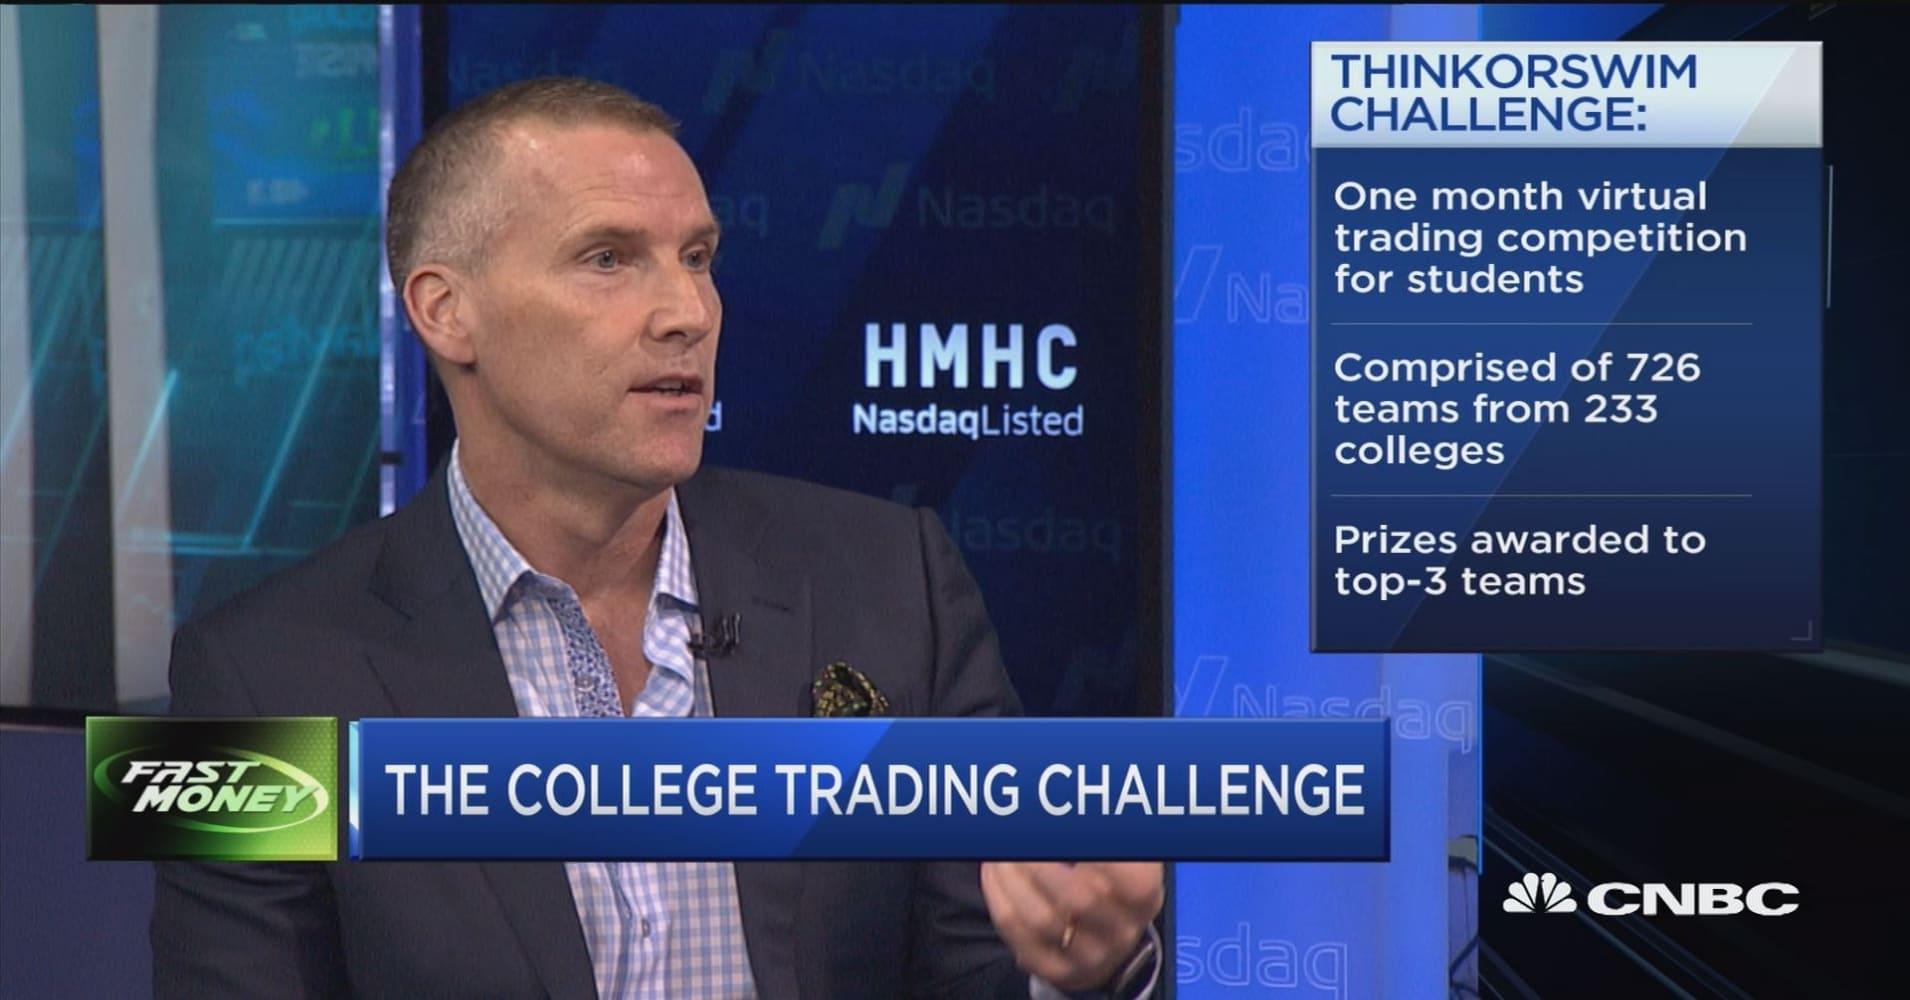 TD Ameritrade's college trading challenge winners